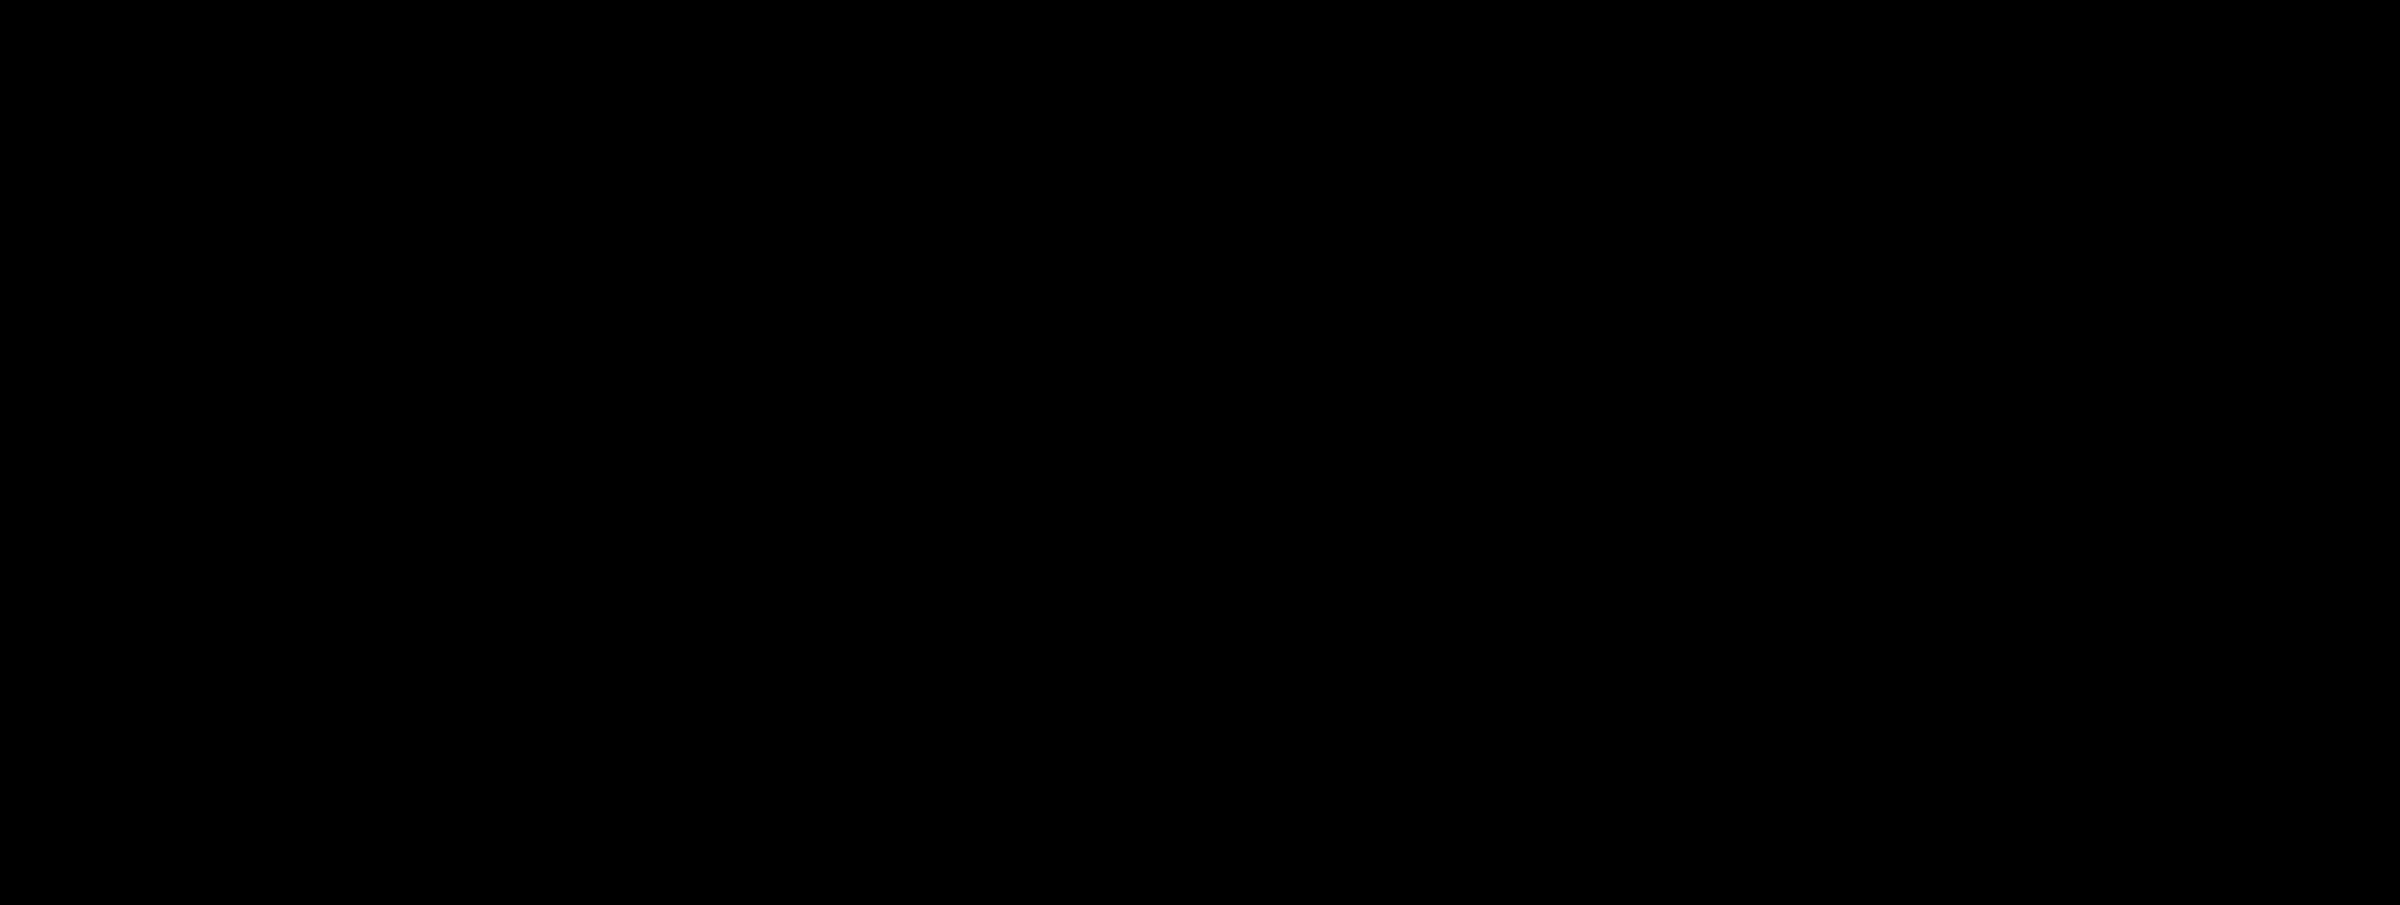 ann-taylor-loft-logo-png-transparent